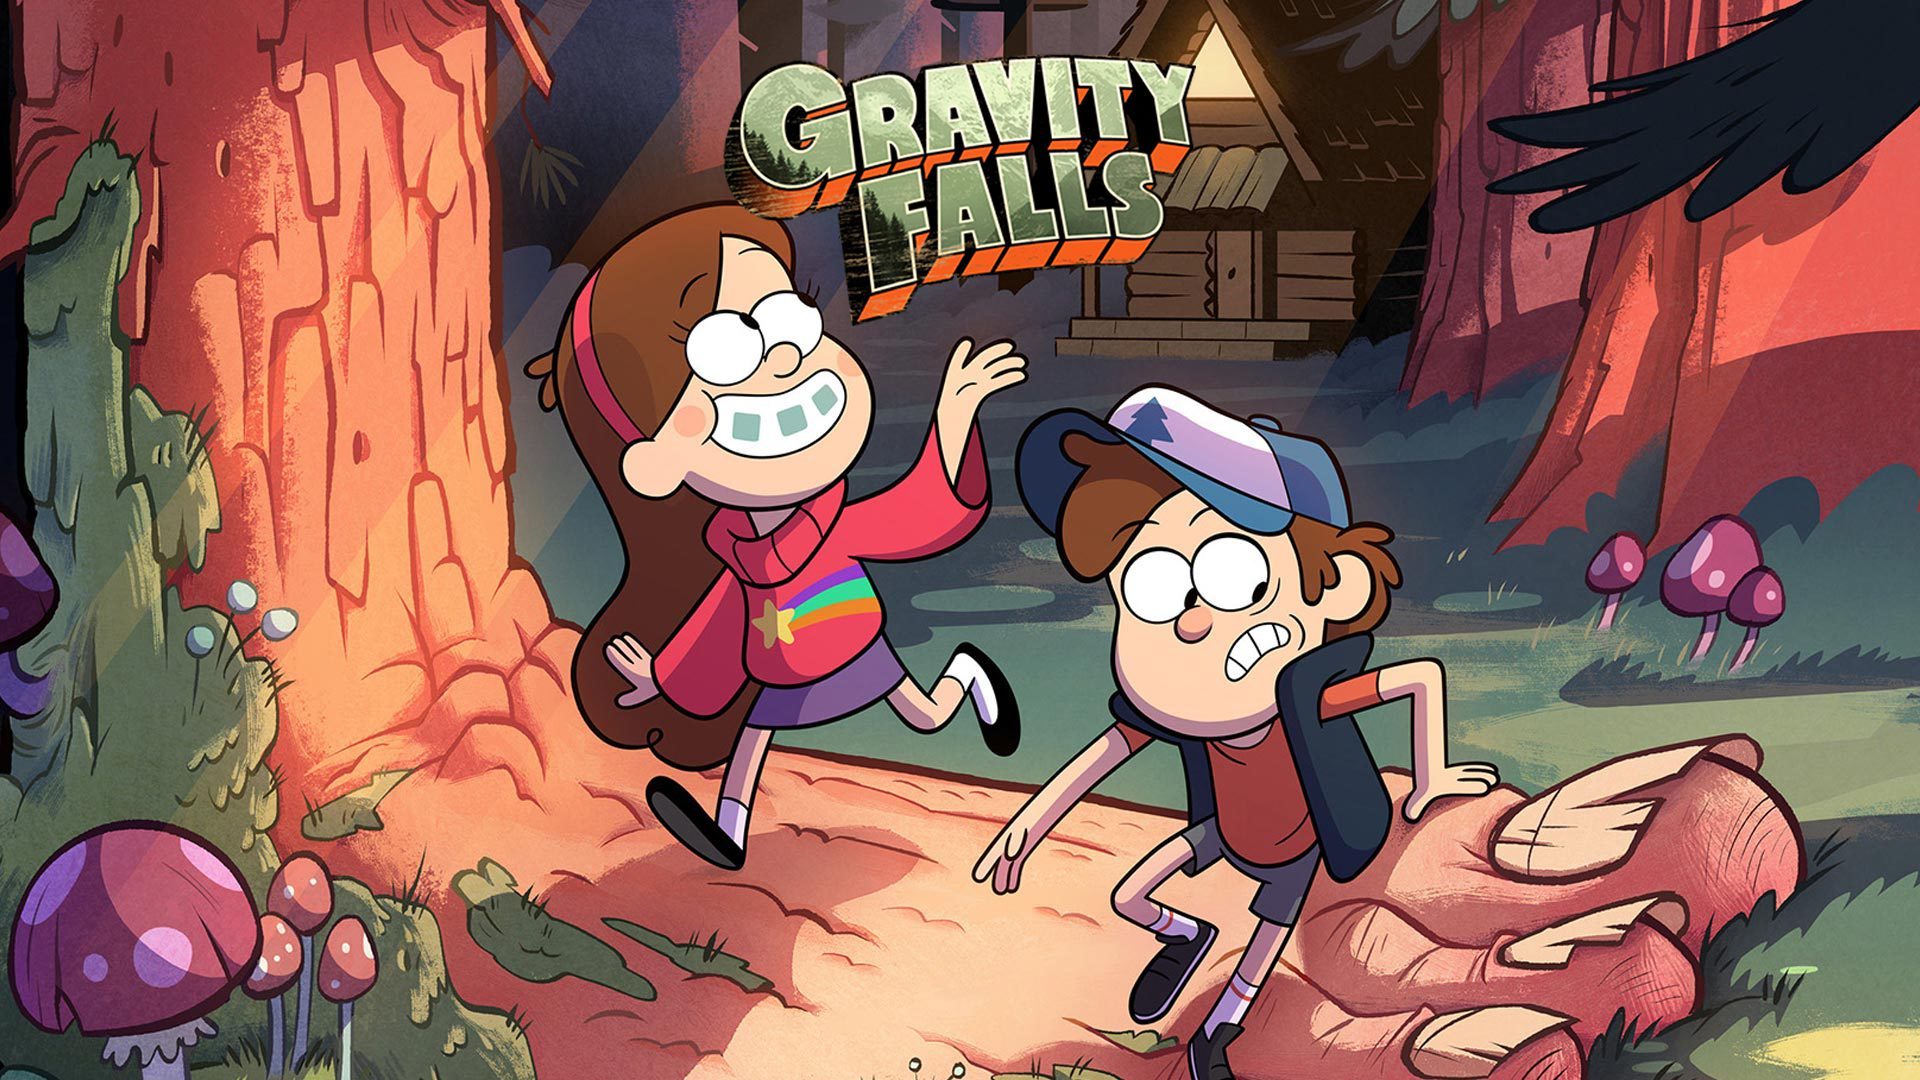 Gravity Falls Volume 1